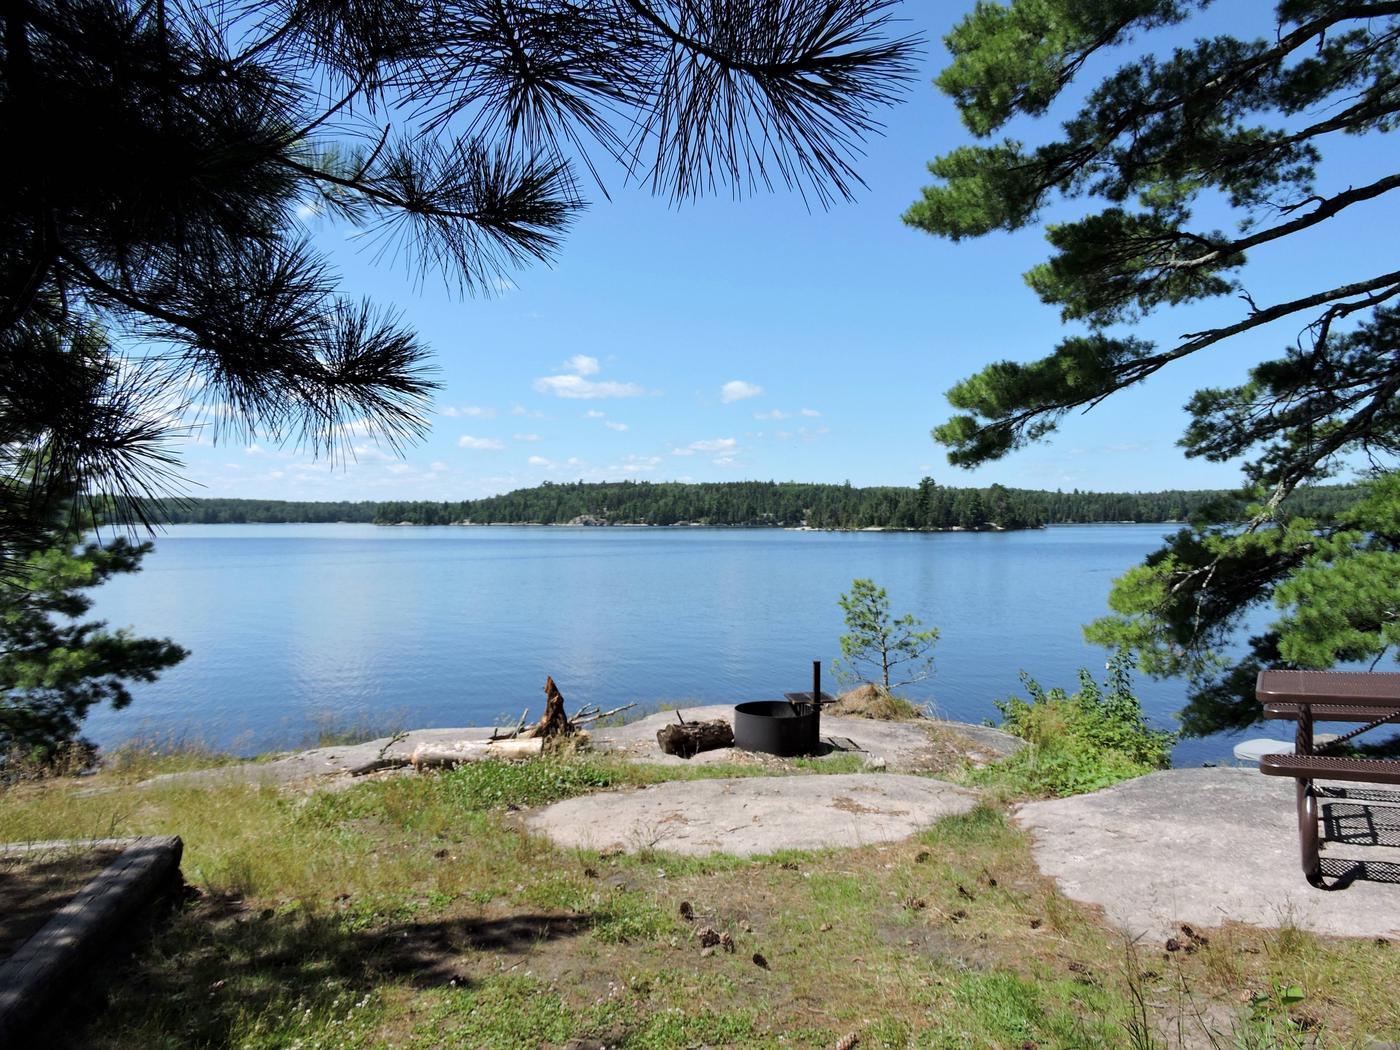 S5 - Feldt ChannelS5 - Feldt Channel campsite on Sandpoint Lake